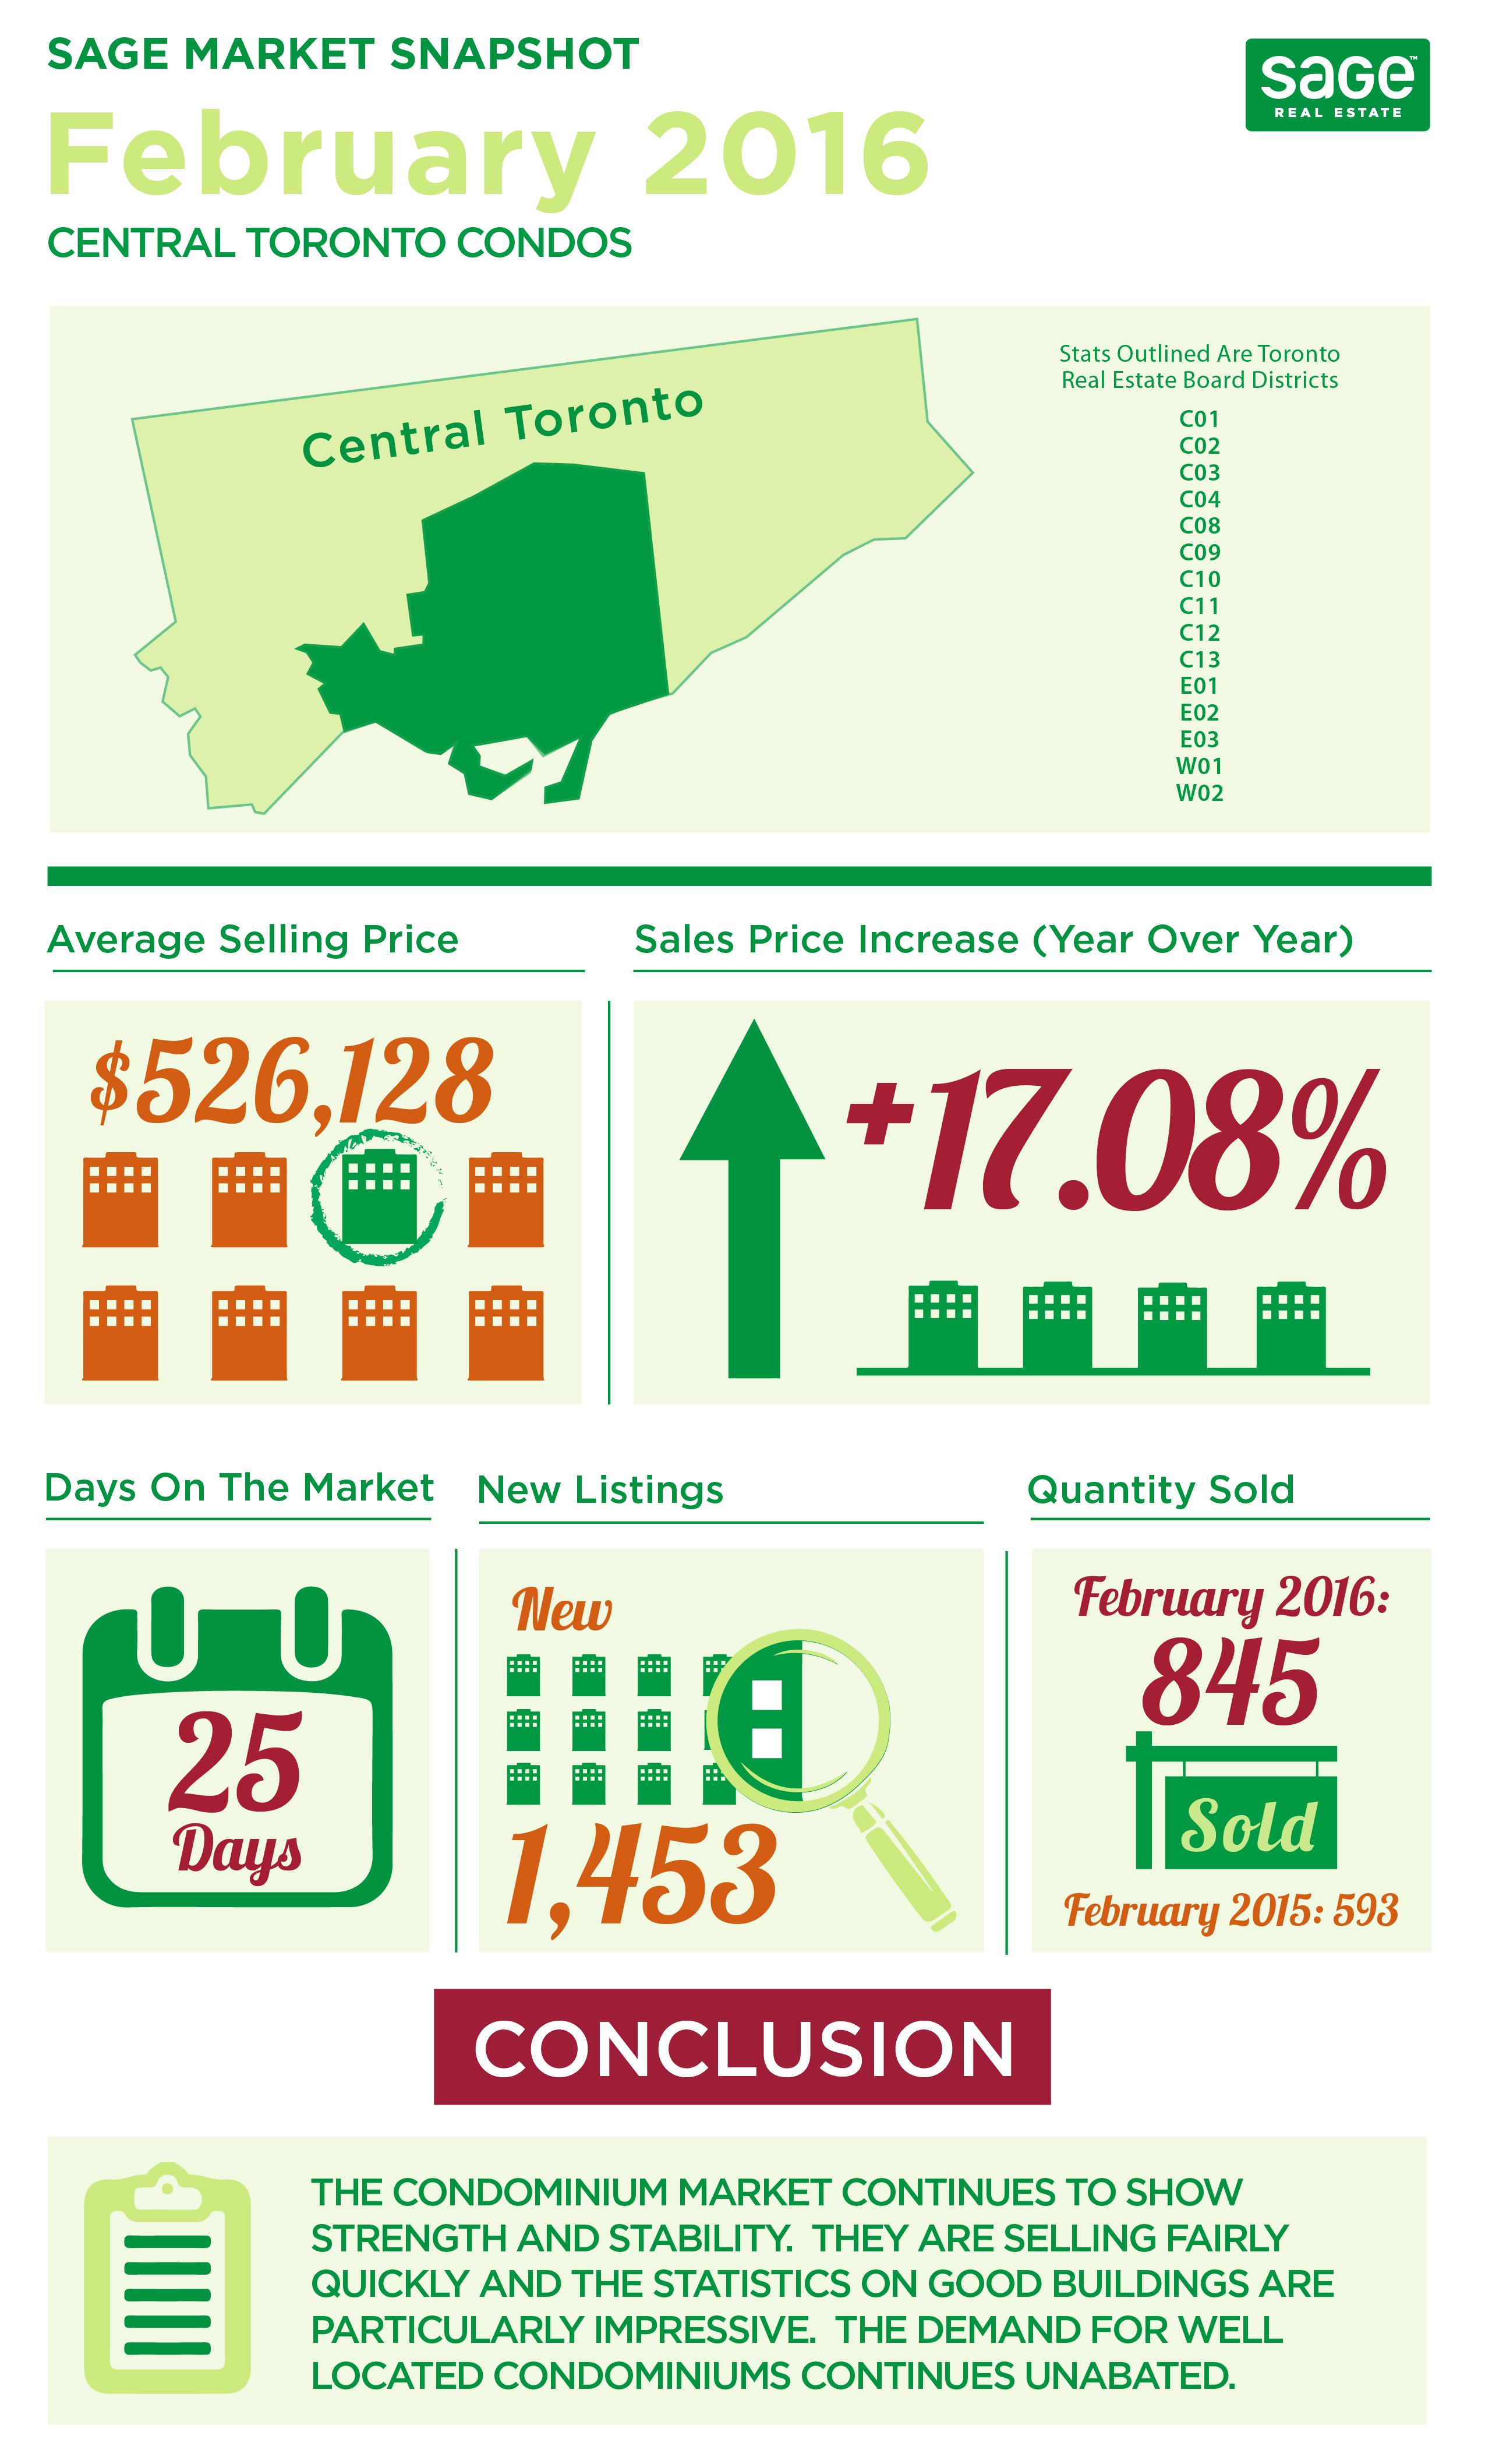 February 2016 Central Toronto Condo Prices